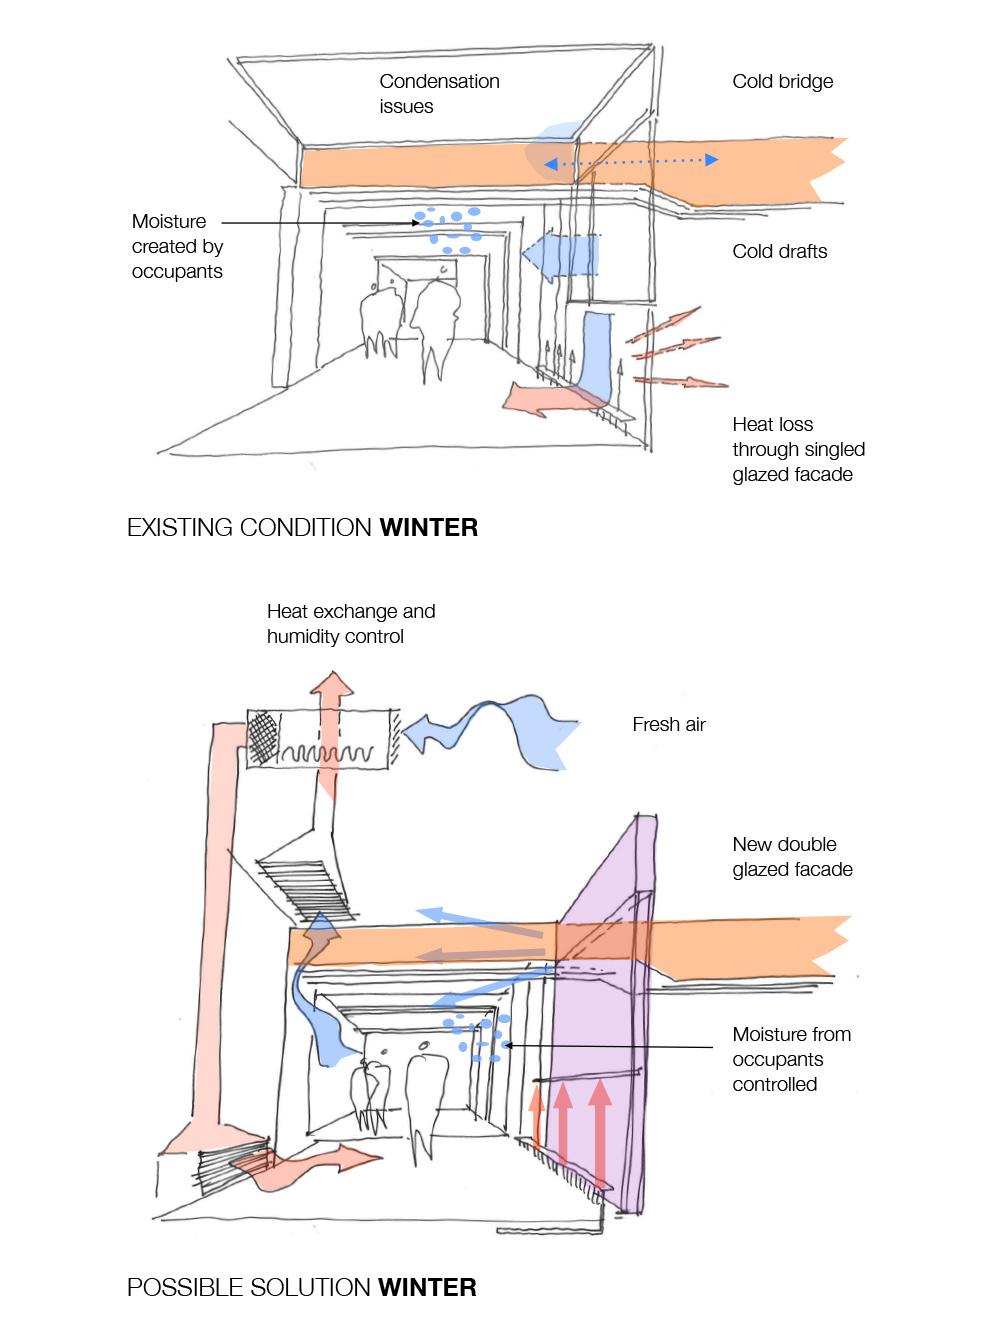 Designengineursbuildingreading8 1000 Design Engine Architects Heat Loss Diagram Urs Building Reading University